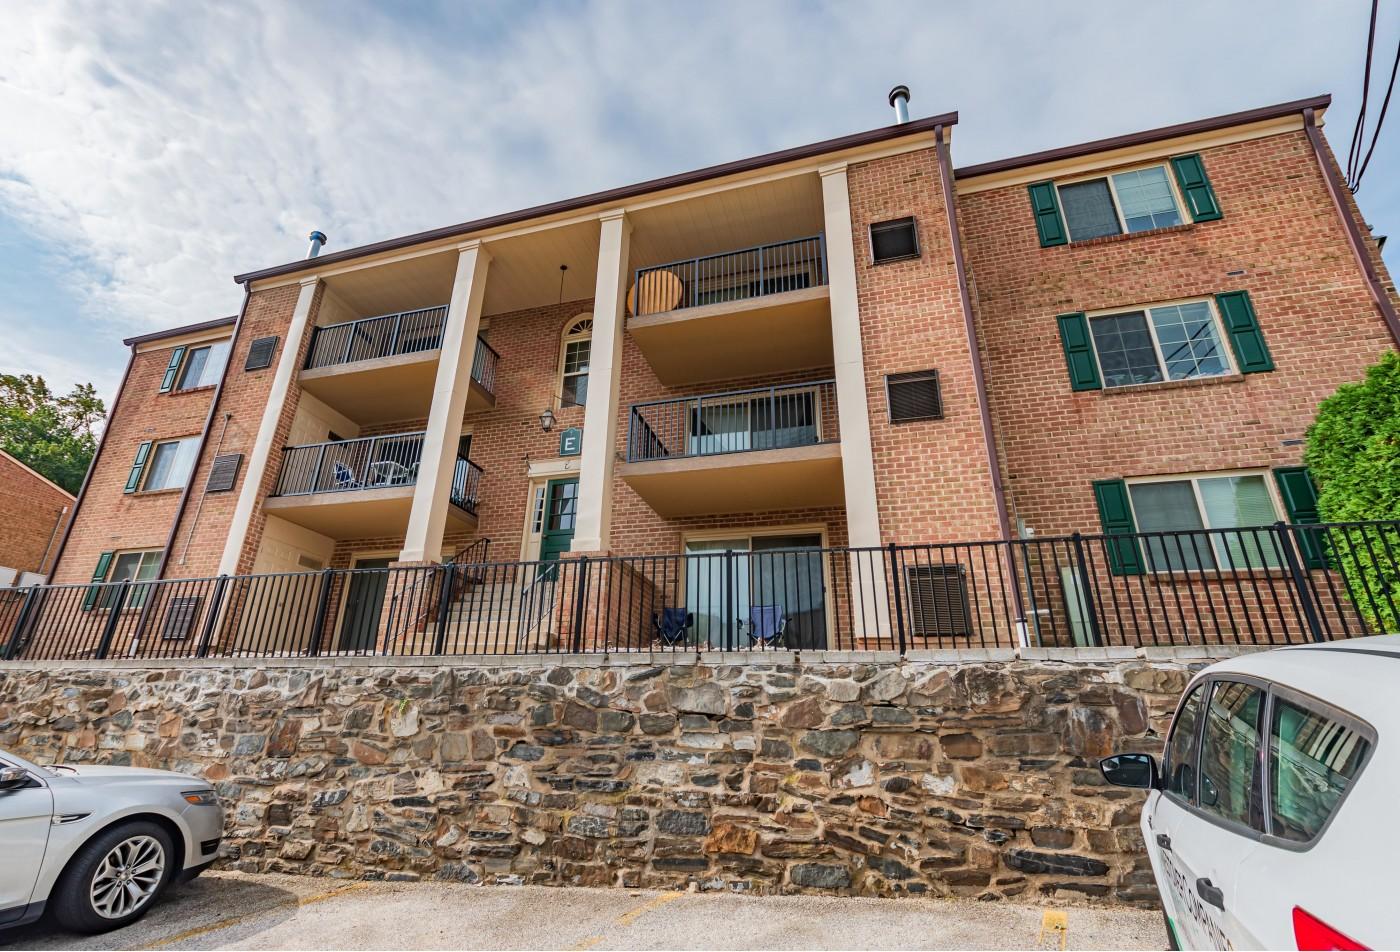 Pet Friendly Apartments In Lansdowne Pa | Hillcrest Apartments